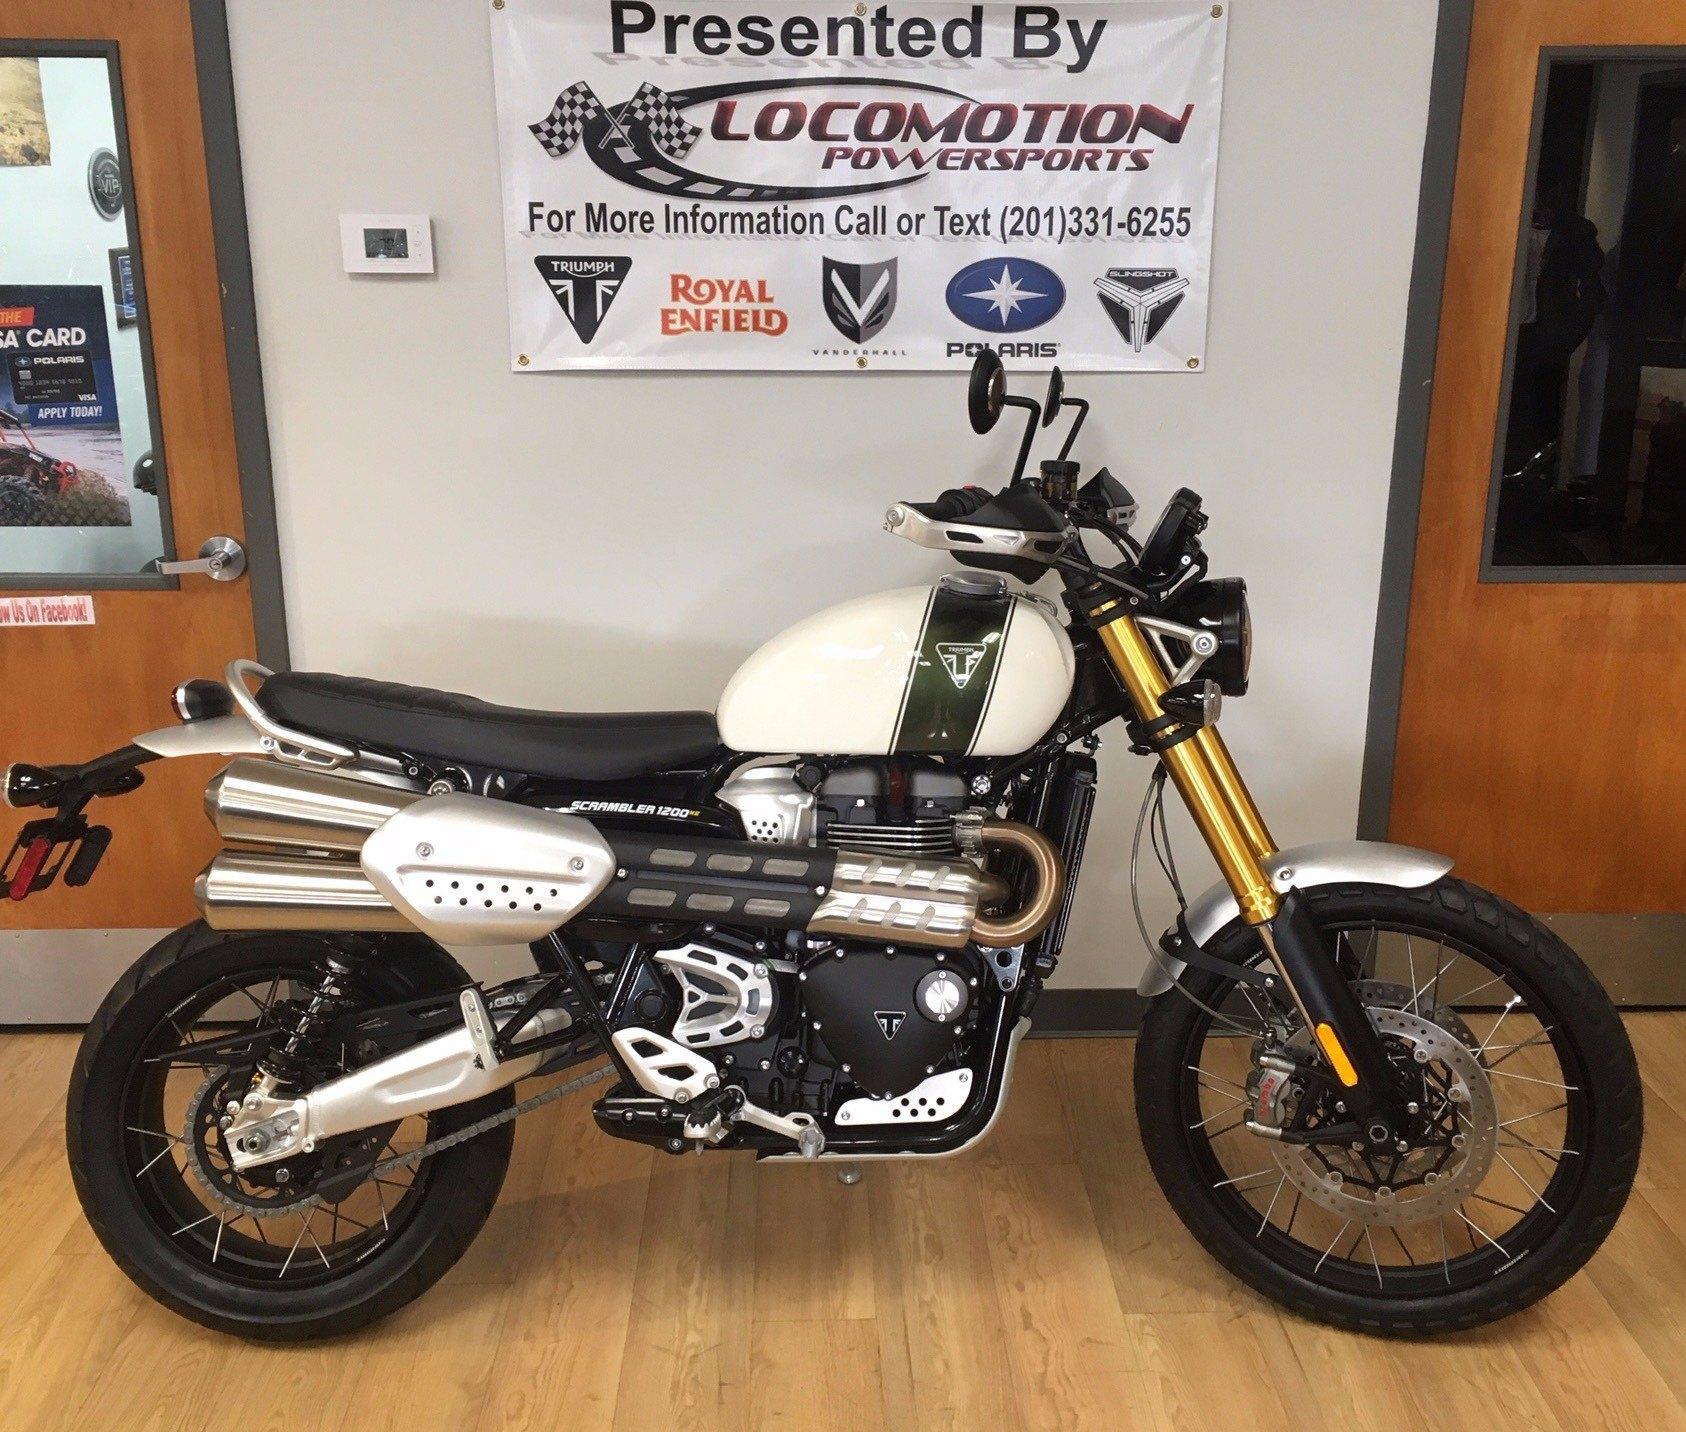 2019 Triumph Scrambler 1200 Xe Showcase Motorcycles Mahwah New Jersey